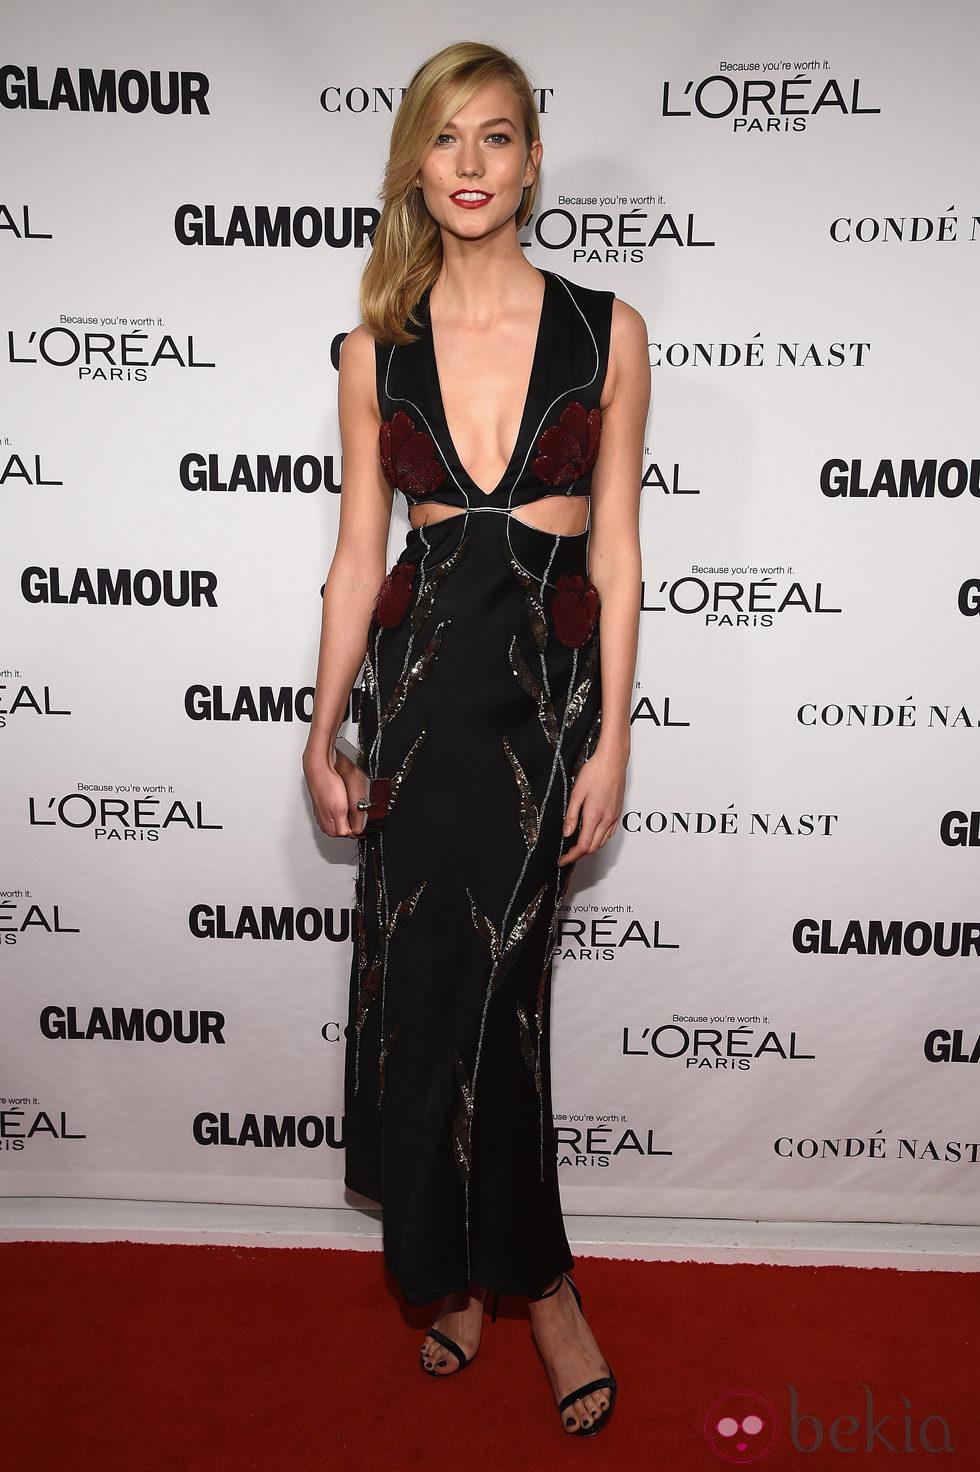 Karlie Kloss en la entrega de los Glamour Women Of The Year Awards 2014